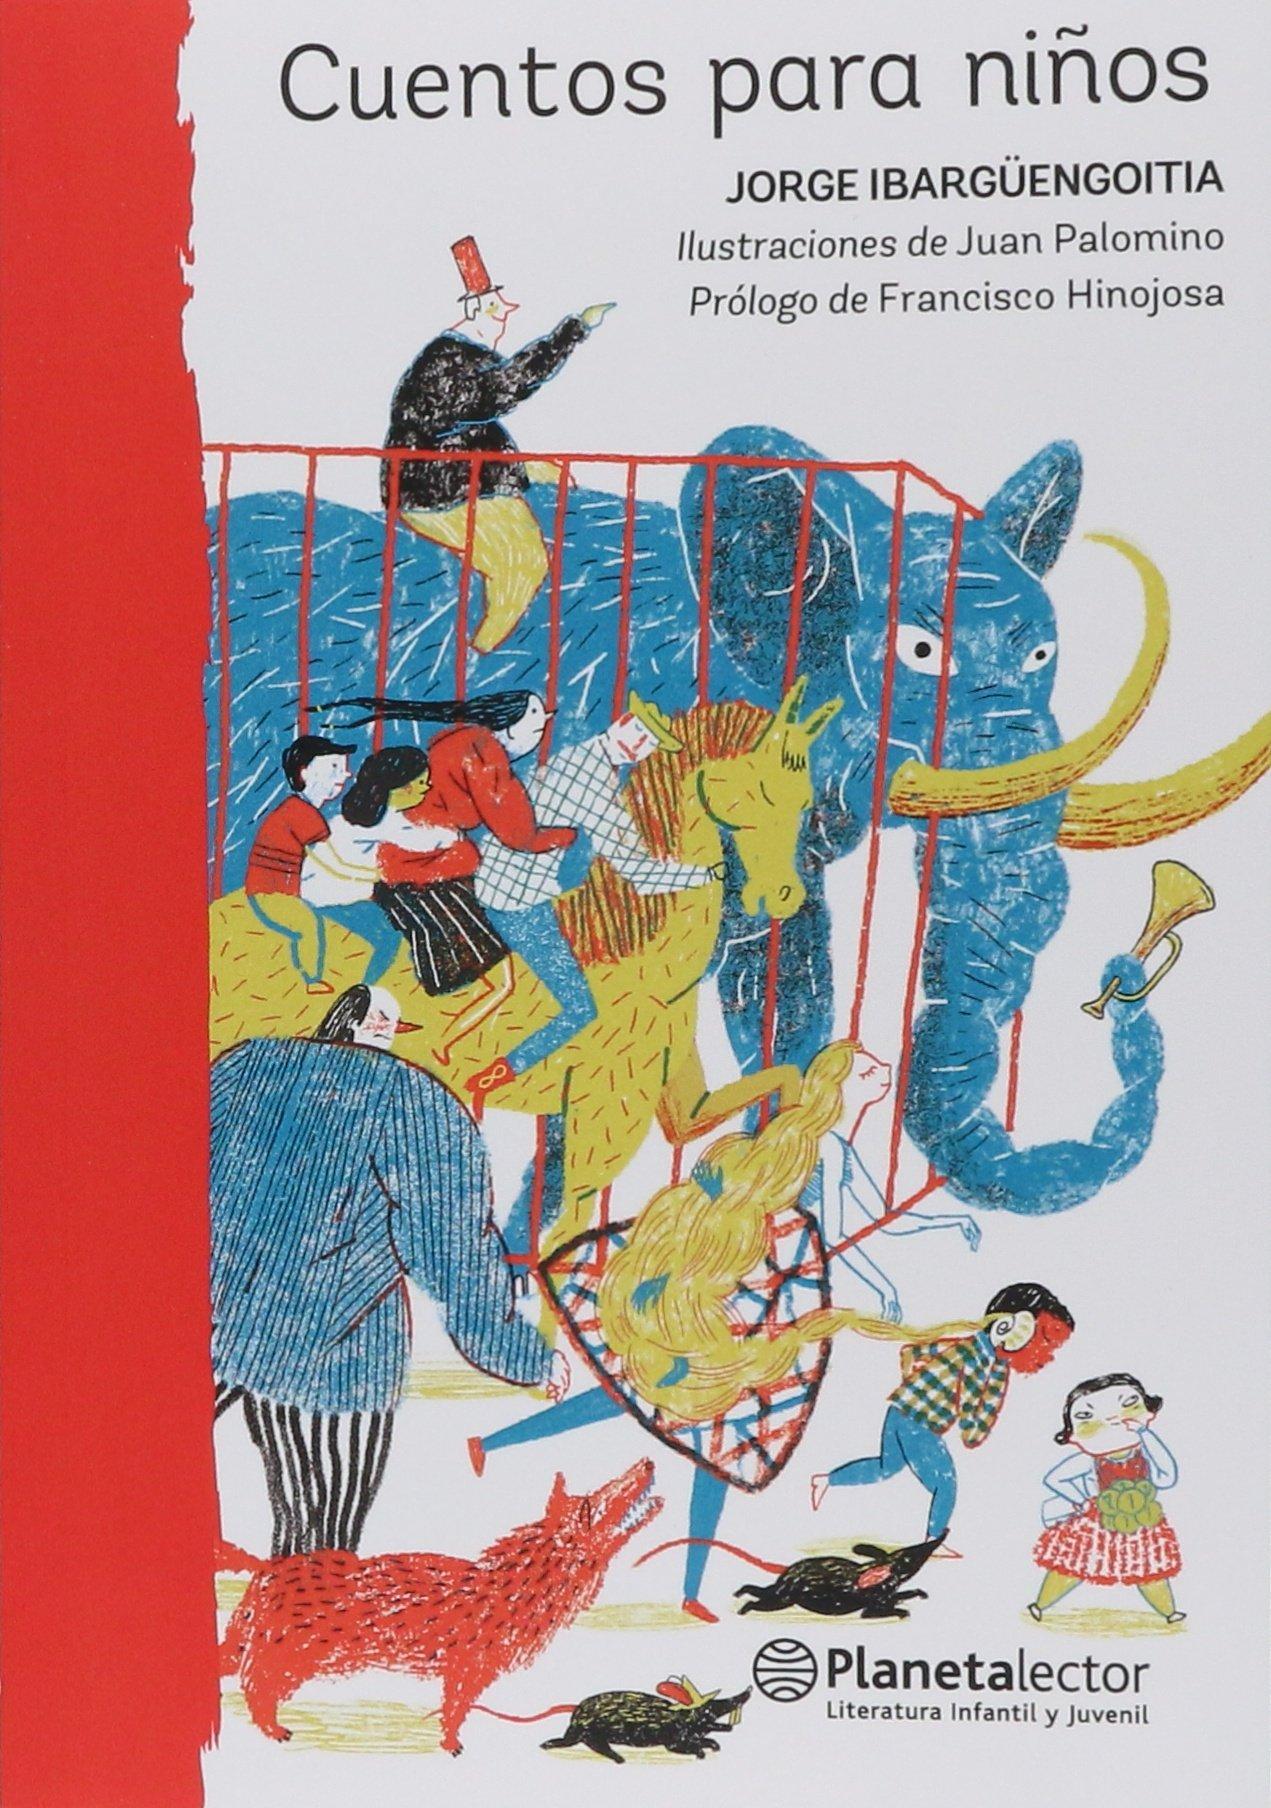 Cuentos para ninos (Spanish Edition): Jorge Ibarguengoitia ...